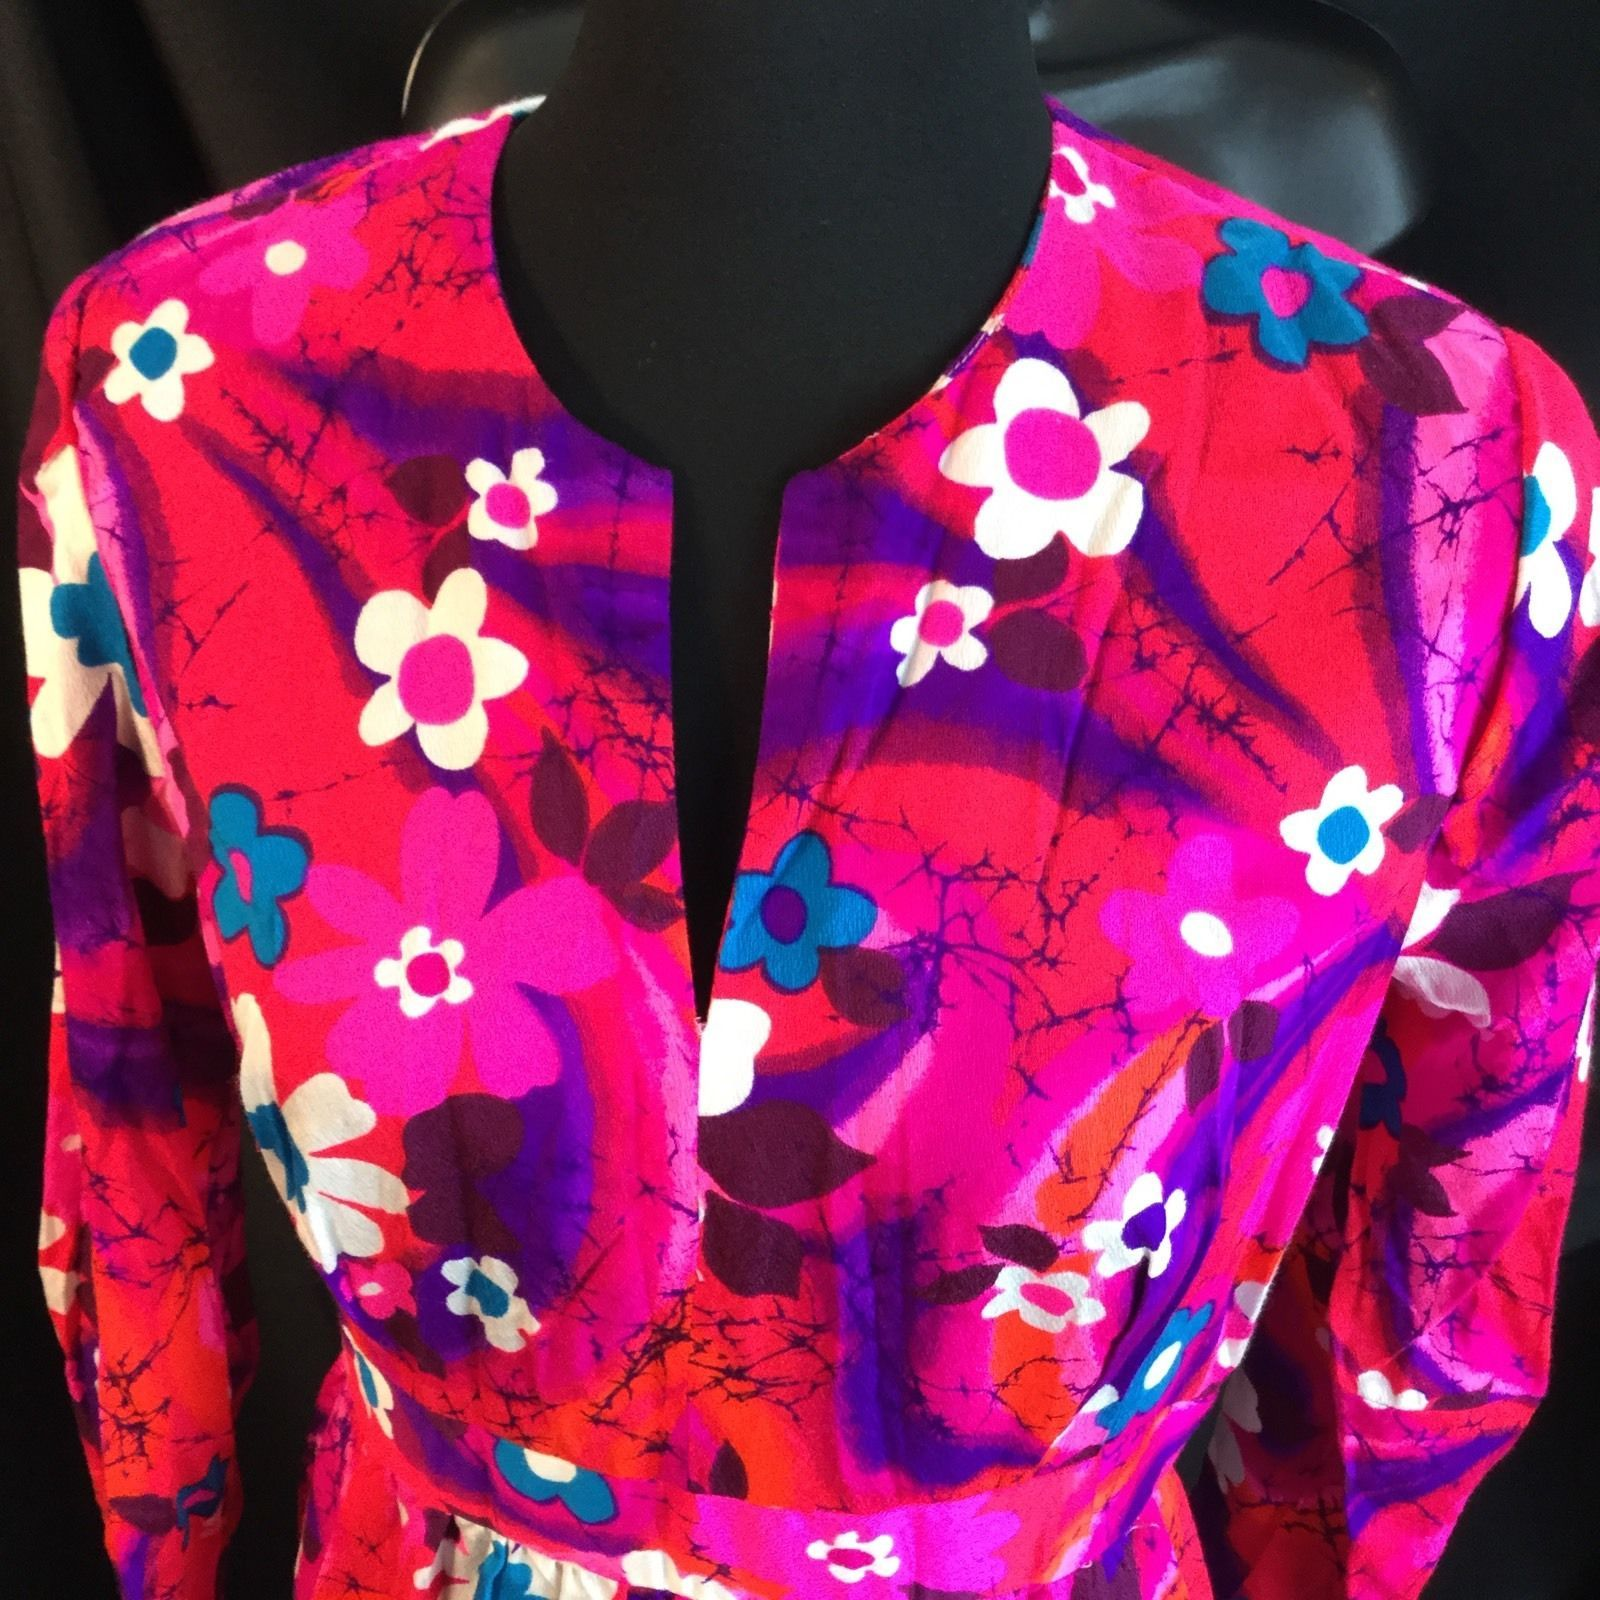 Flower Power Groovy Rayon Barkcloth Dress Long Sleeve Boho Hostess M Homesewn